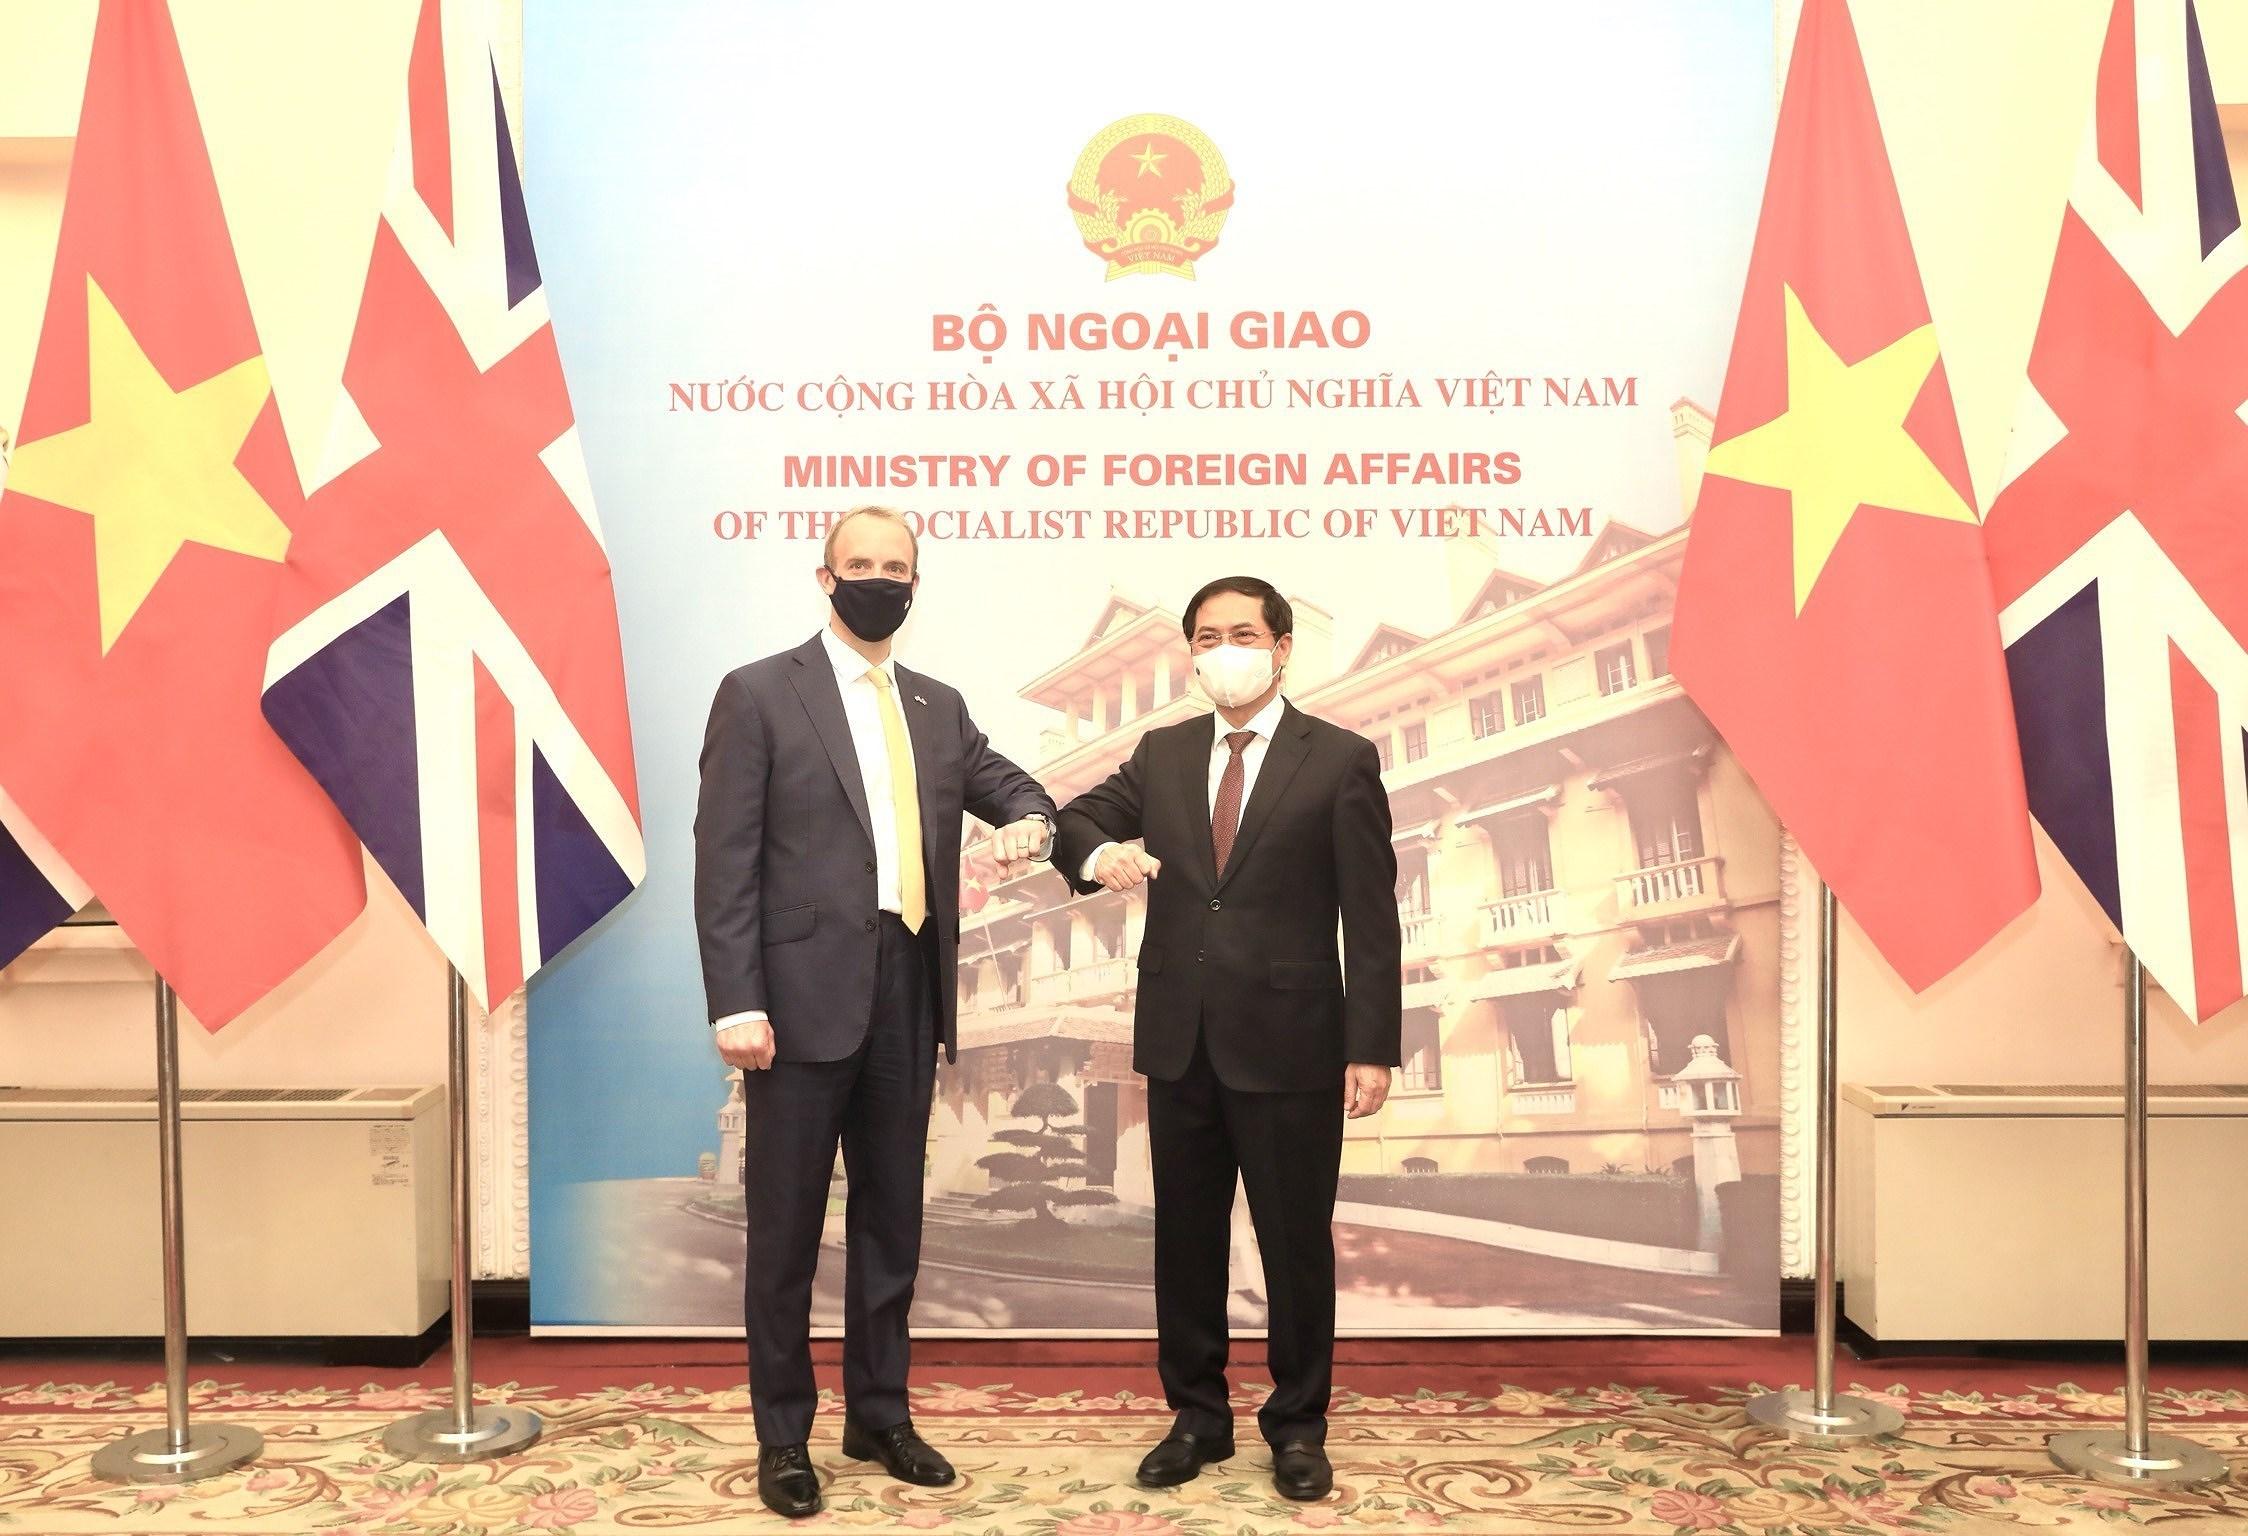 Top diplomats of Vietnam, UK hold talks in Hanoi hinh anh 1